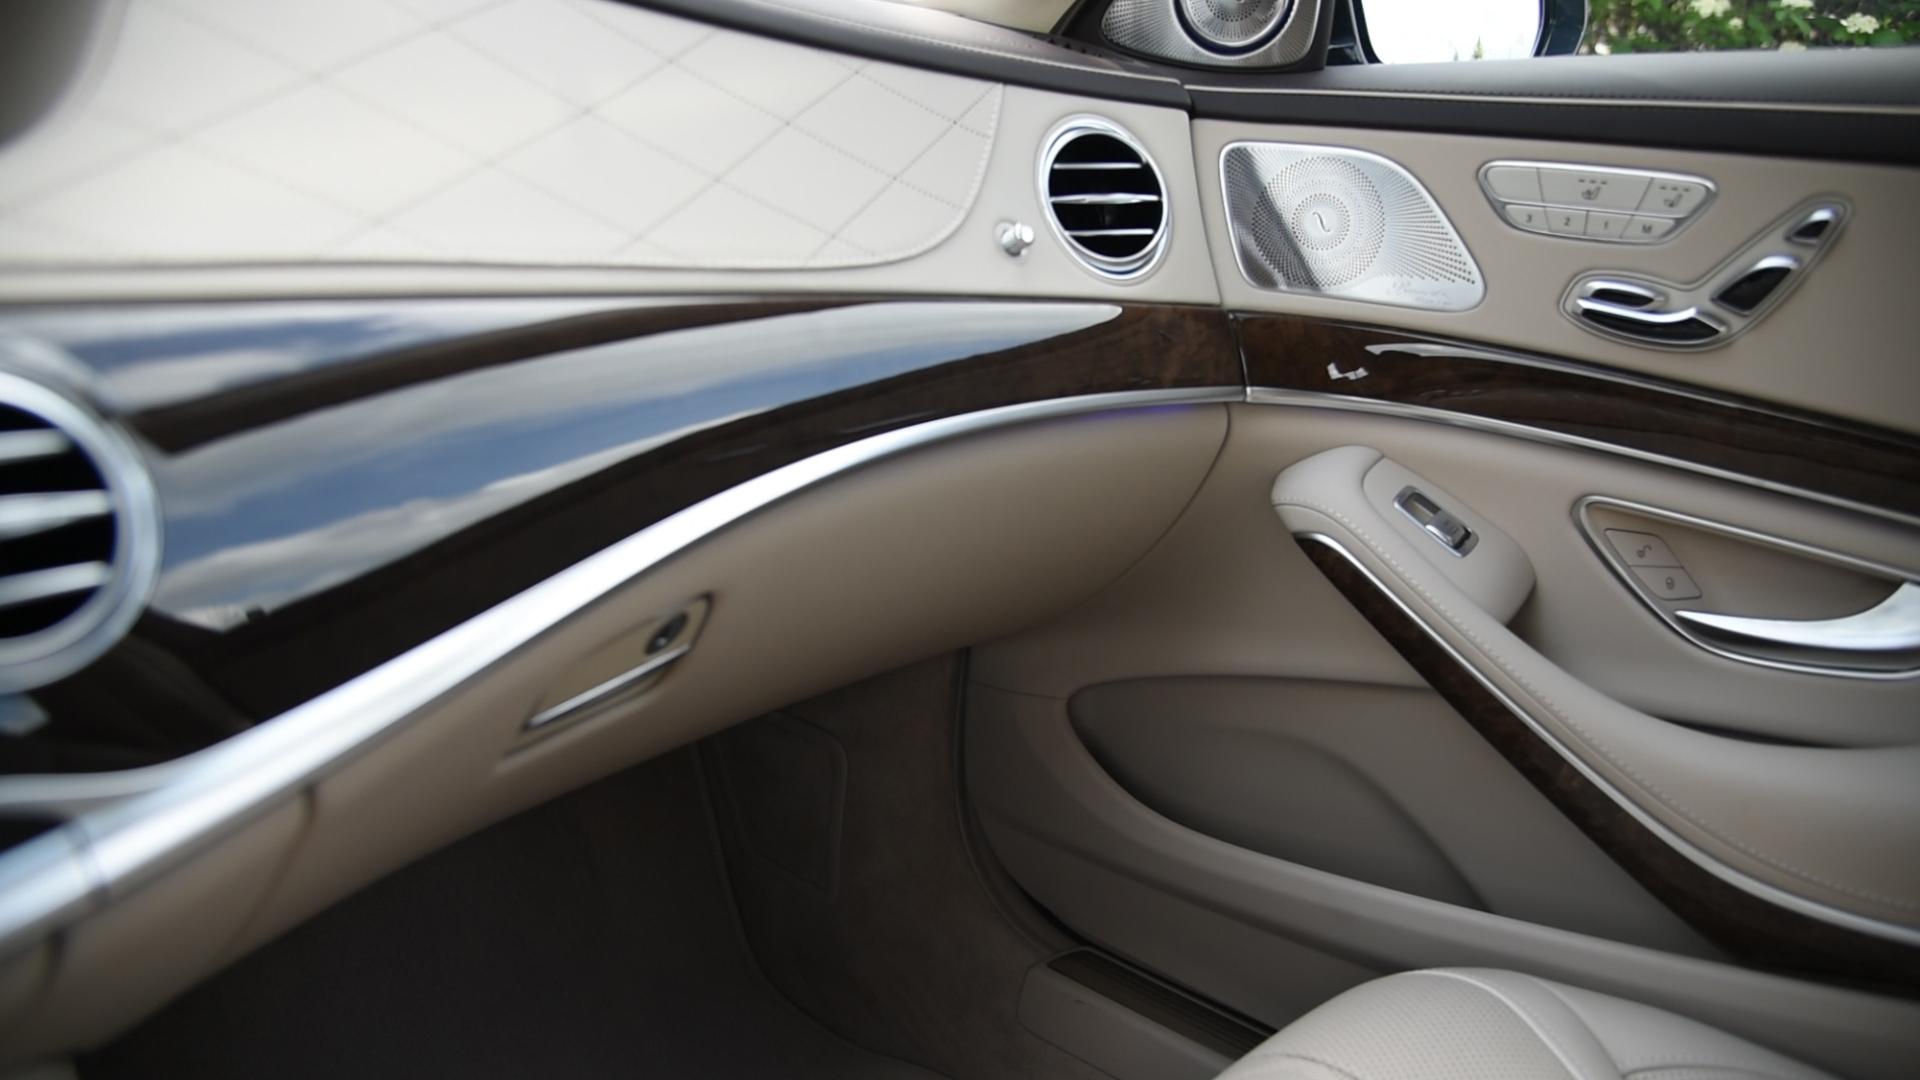 2016 mercedes maybach s600 interior 03 - Mercedes Maybach Interior